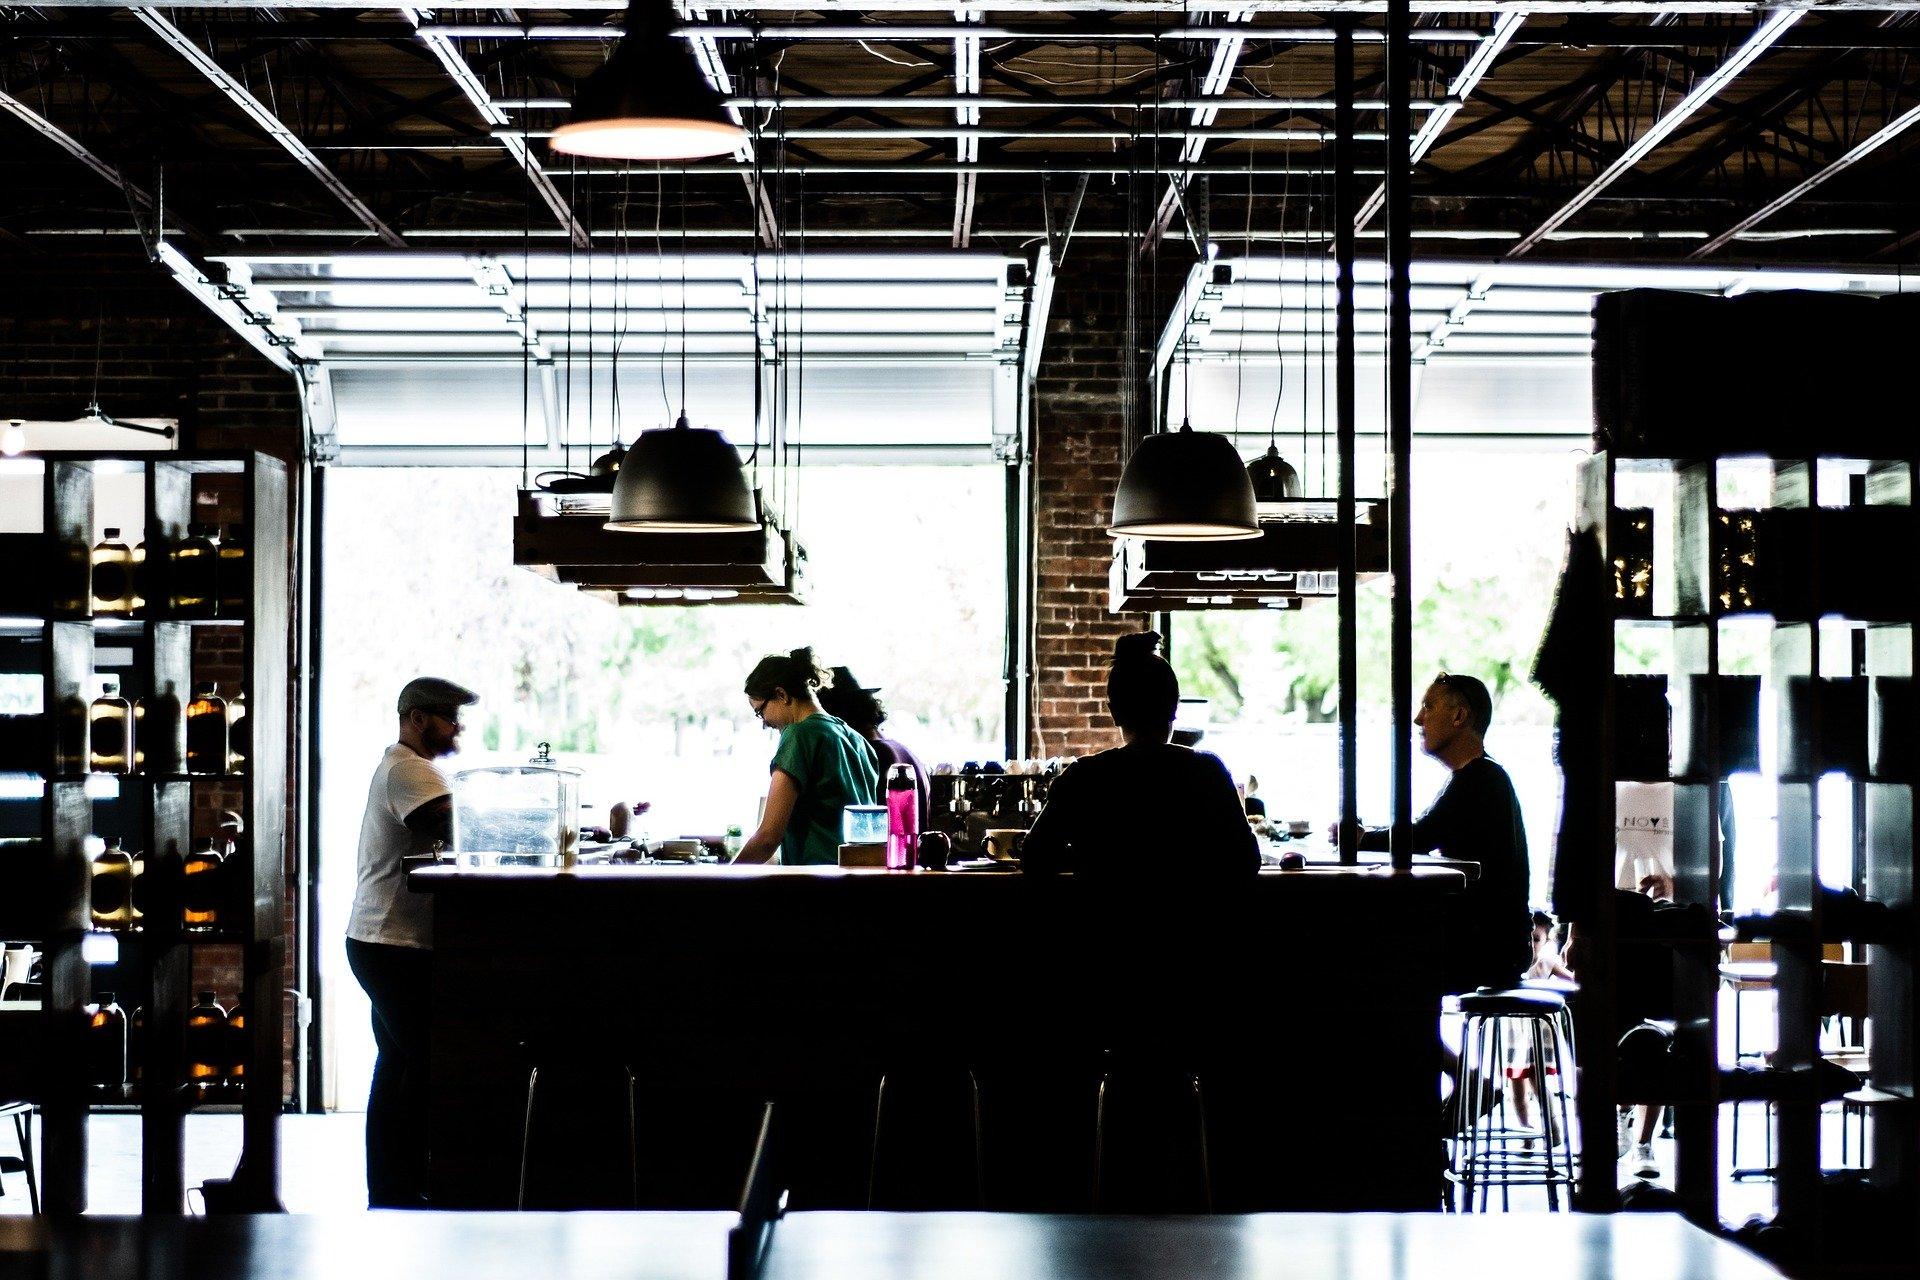 Bar - Comptoir et bartenders